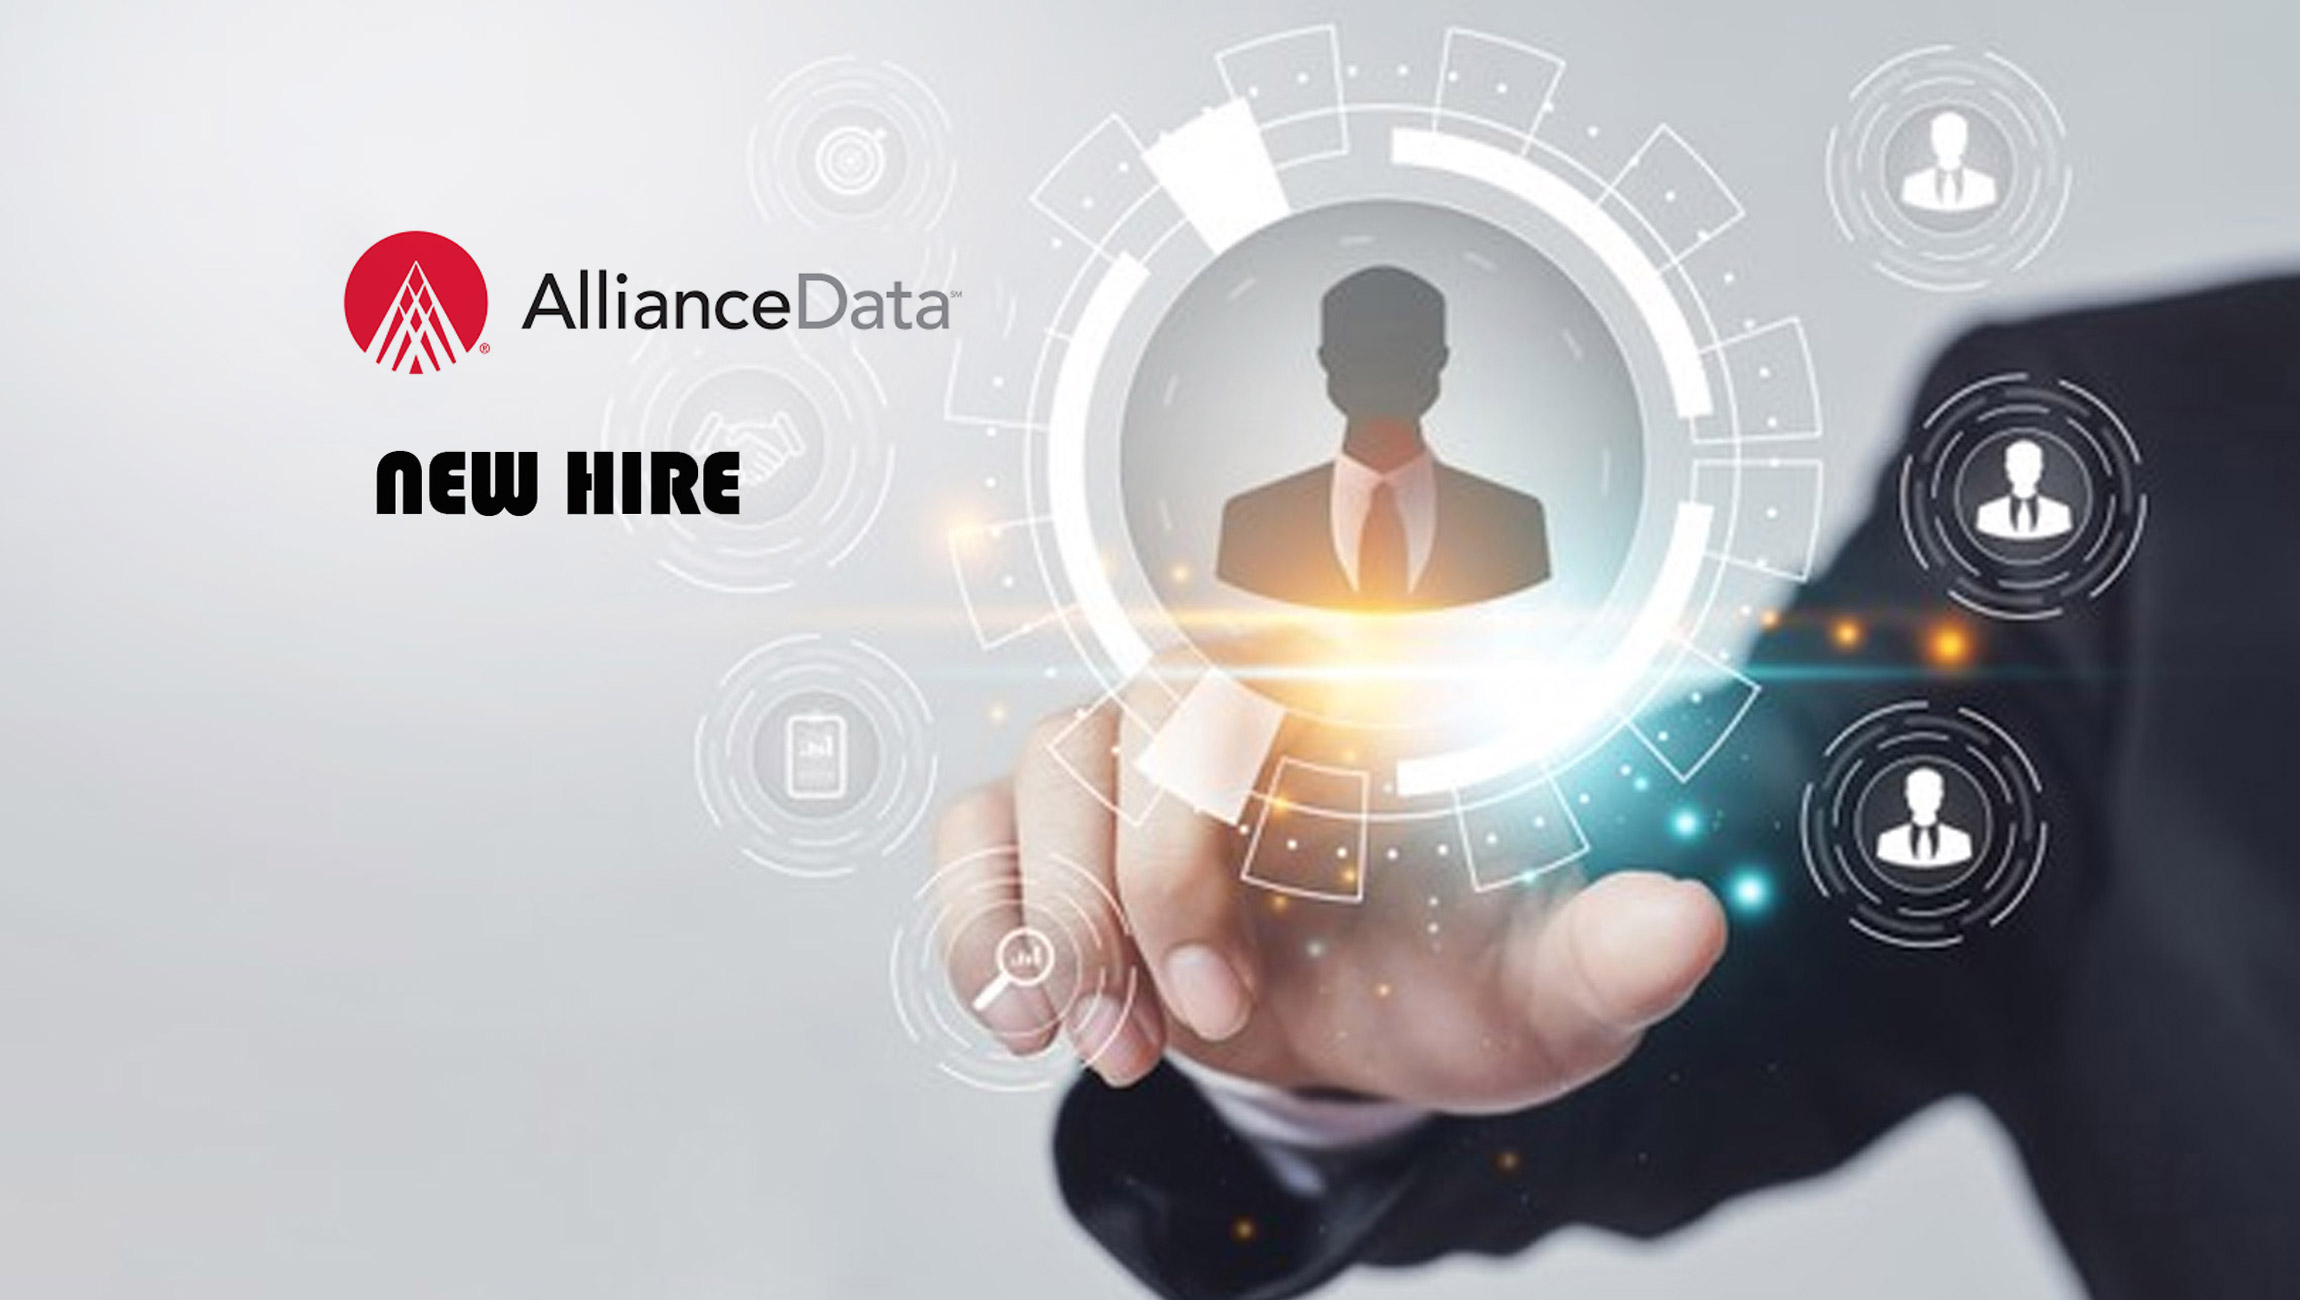 Alliance Data Names New CFO